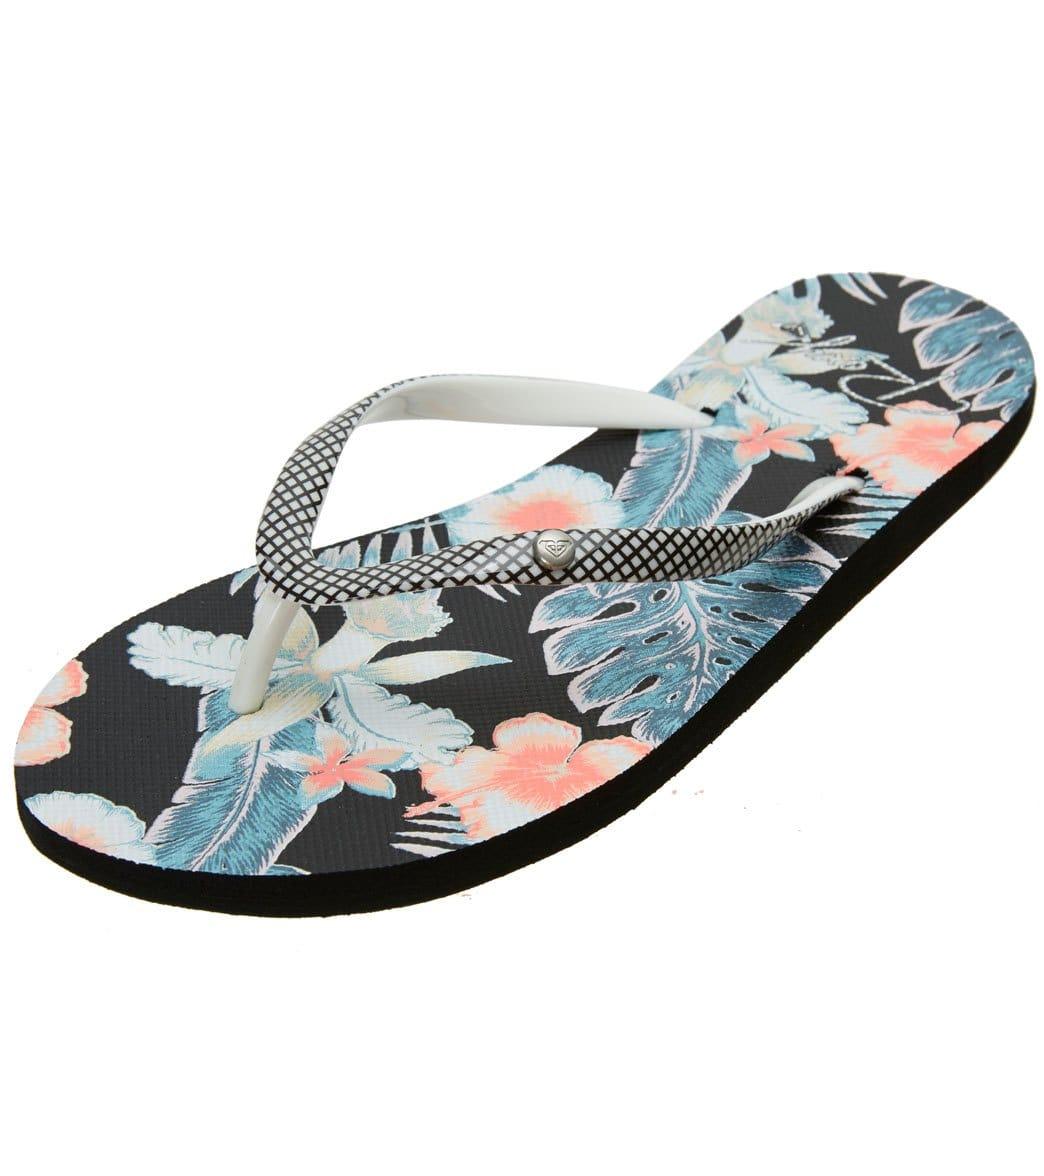 98eb9d678 Roxy Women s Portofino II Flop Flop at SwimOutlet.com